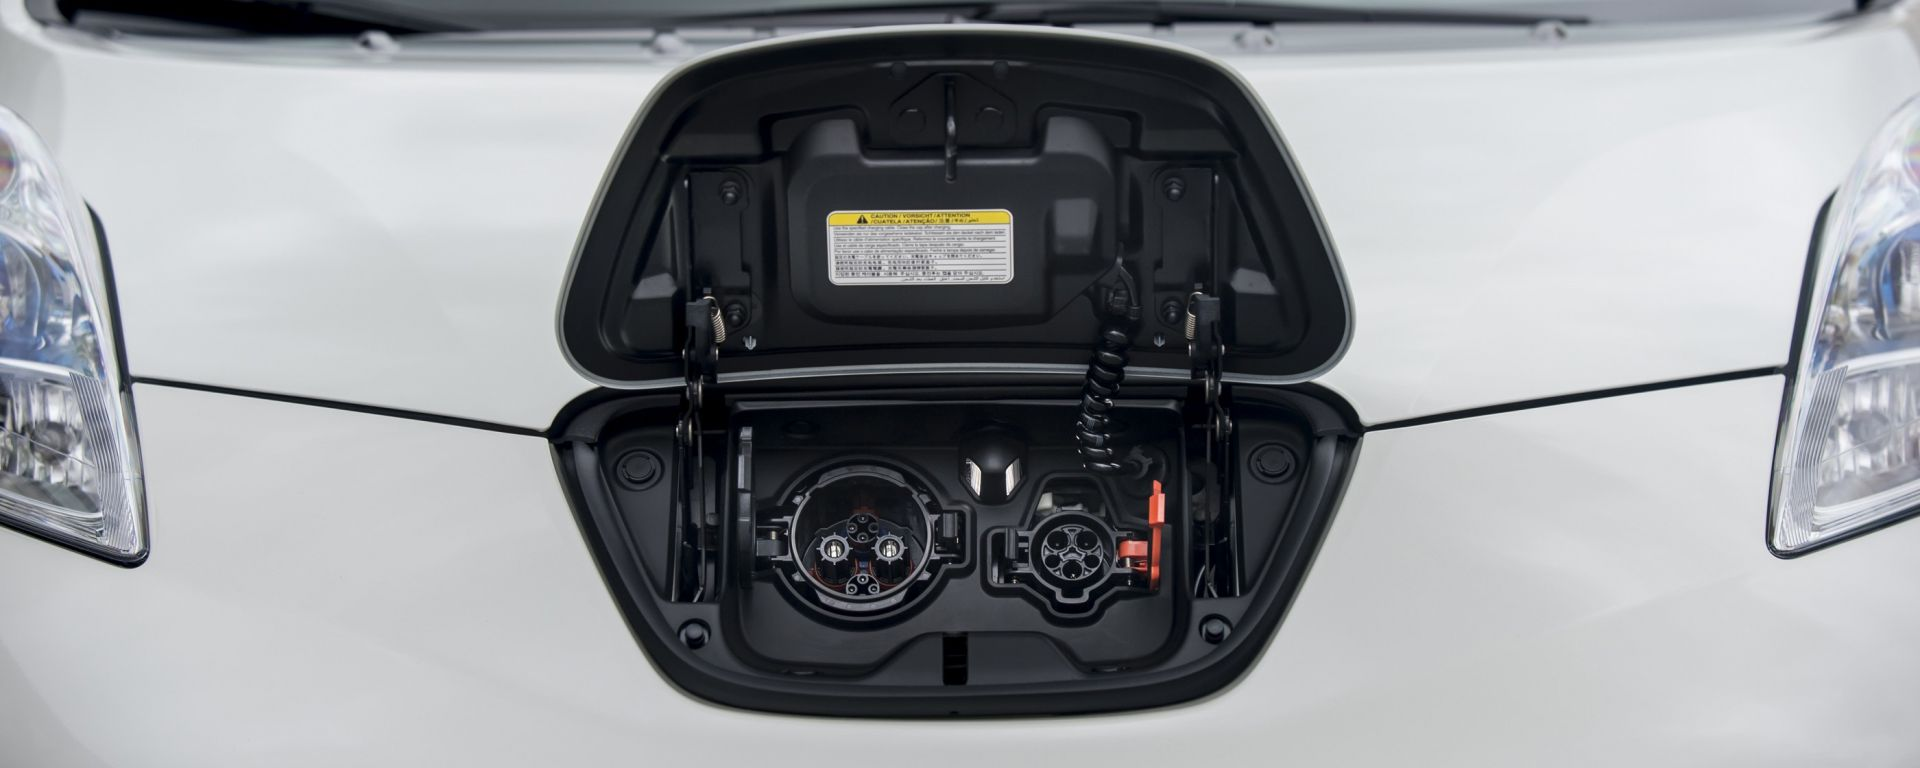 Nissan: al via in Gran Bretagna un progetto Vehicle-to-Grid